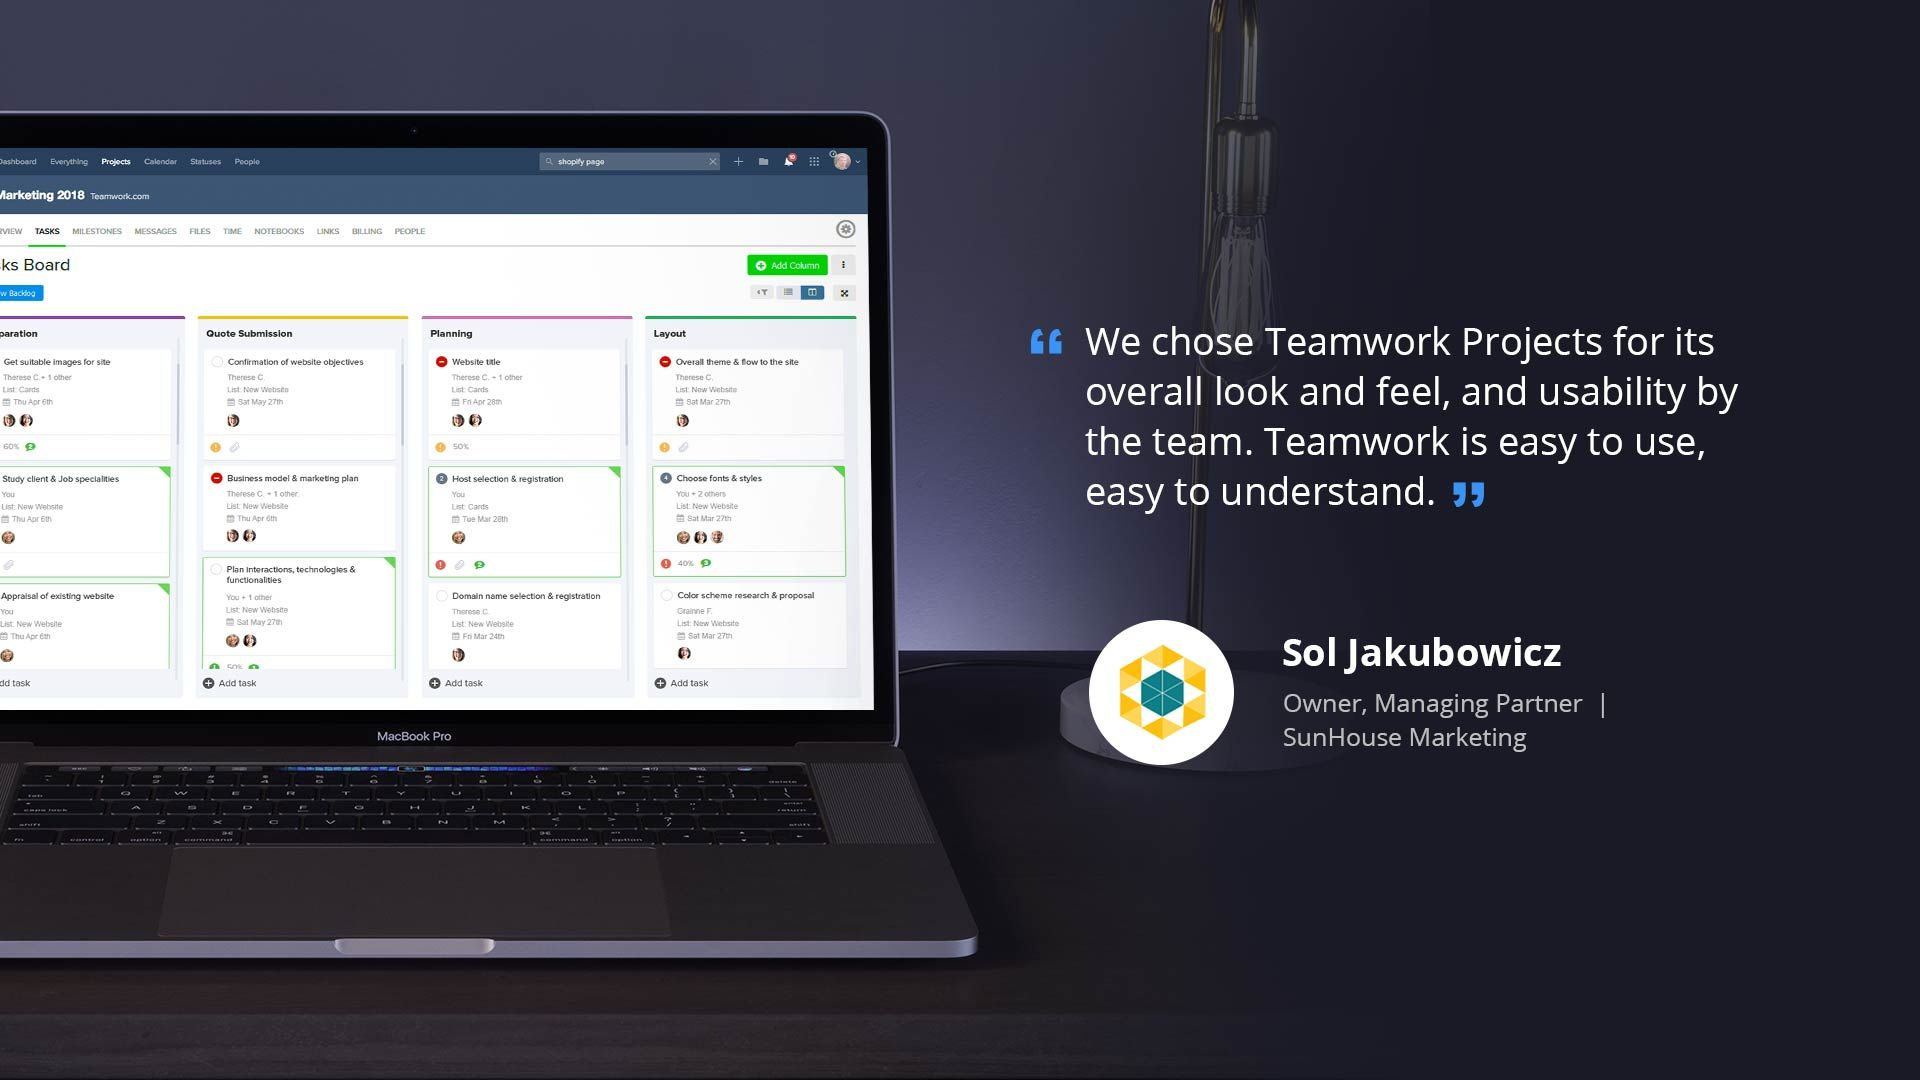 SunHouse and Teamwork Projects | Teamwork.com